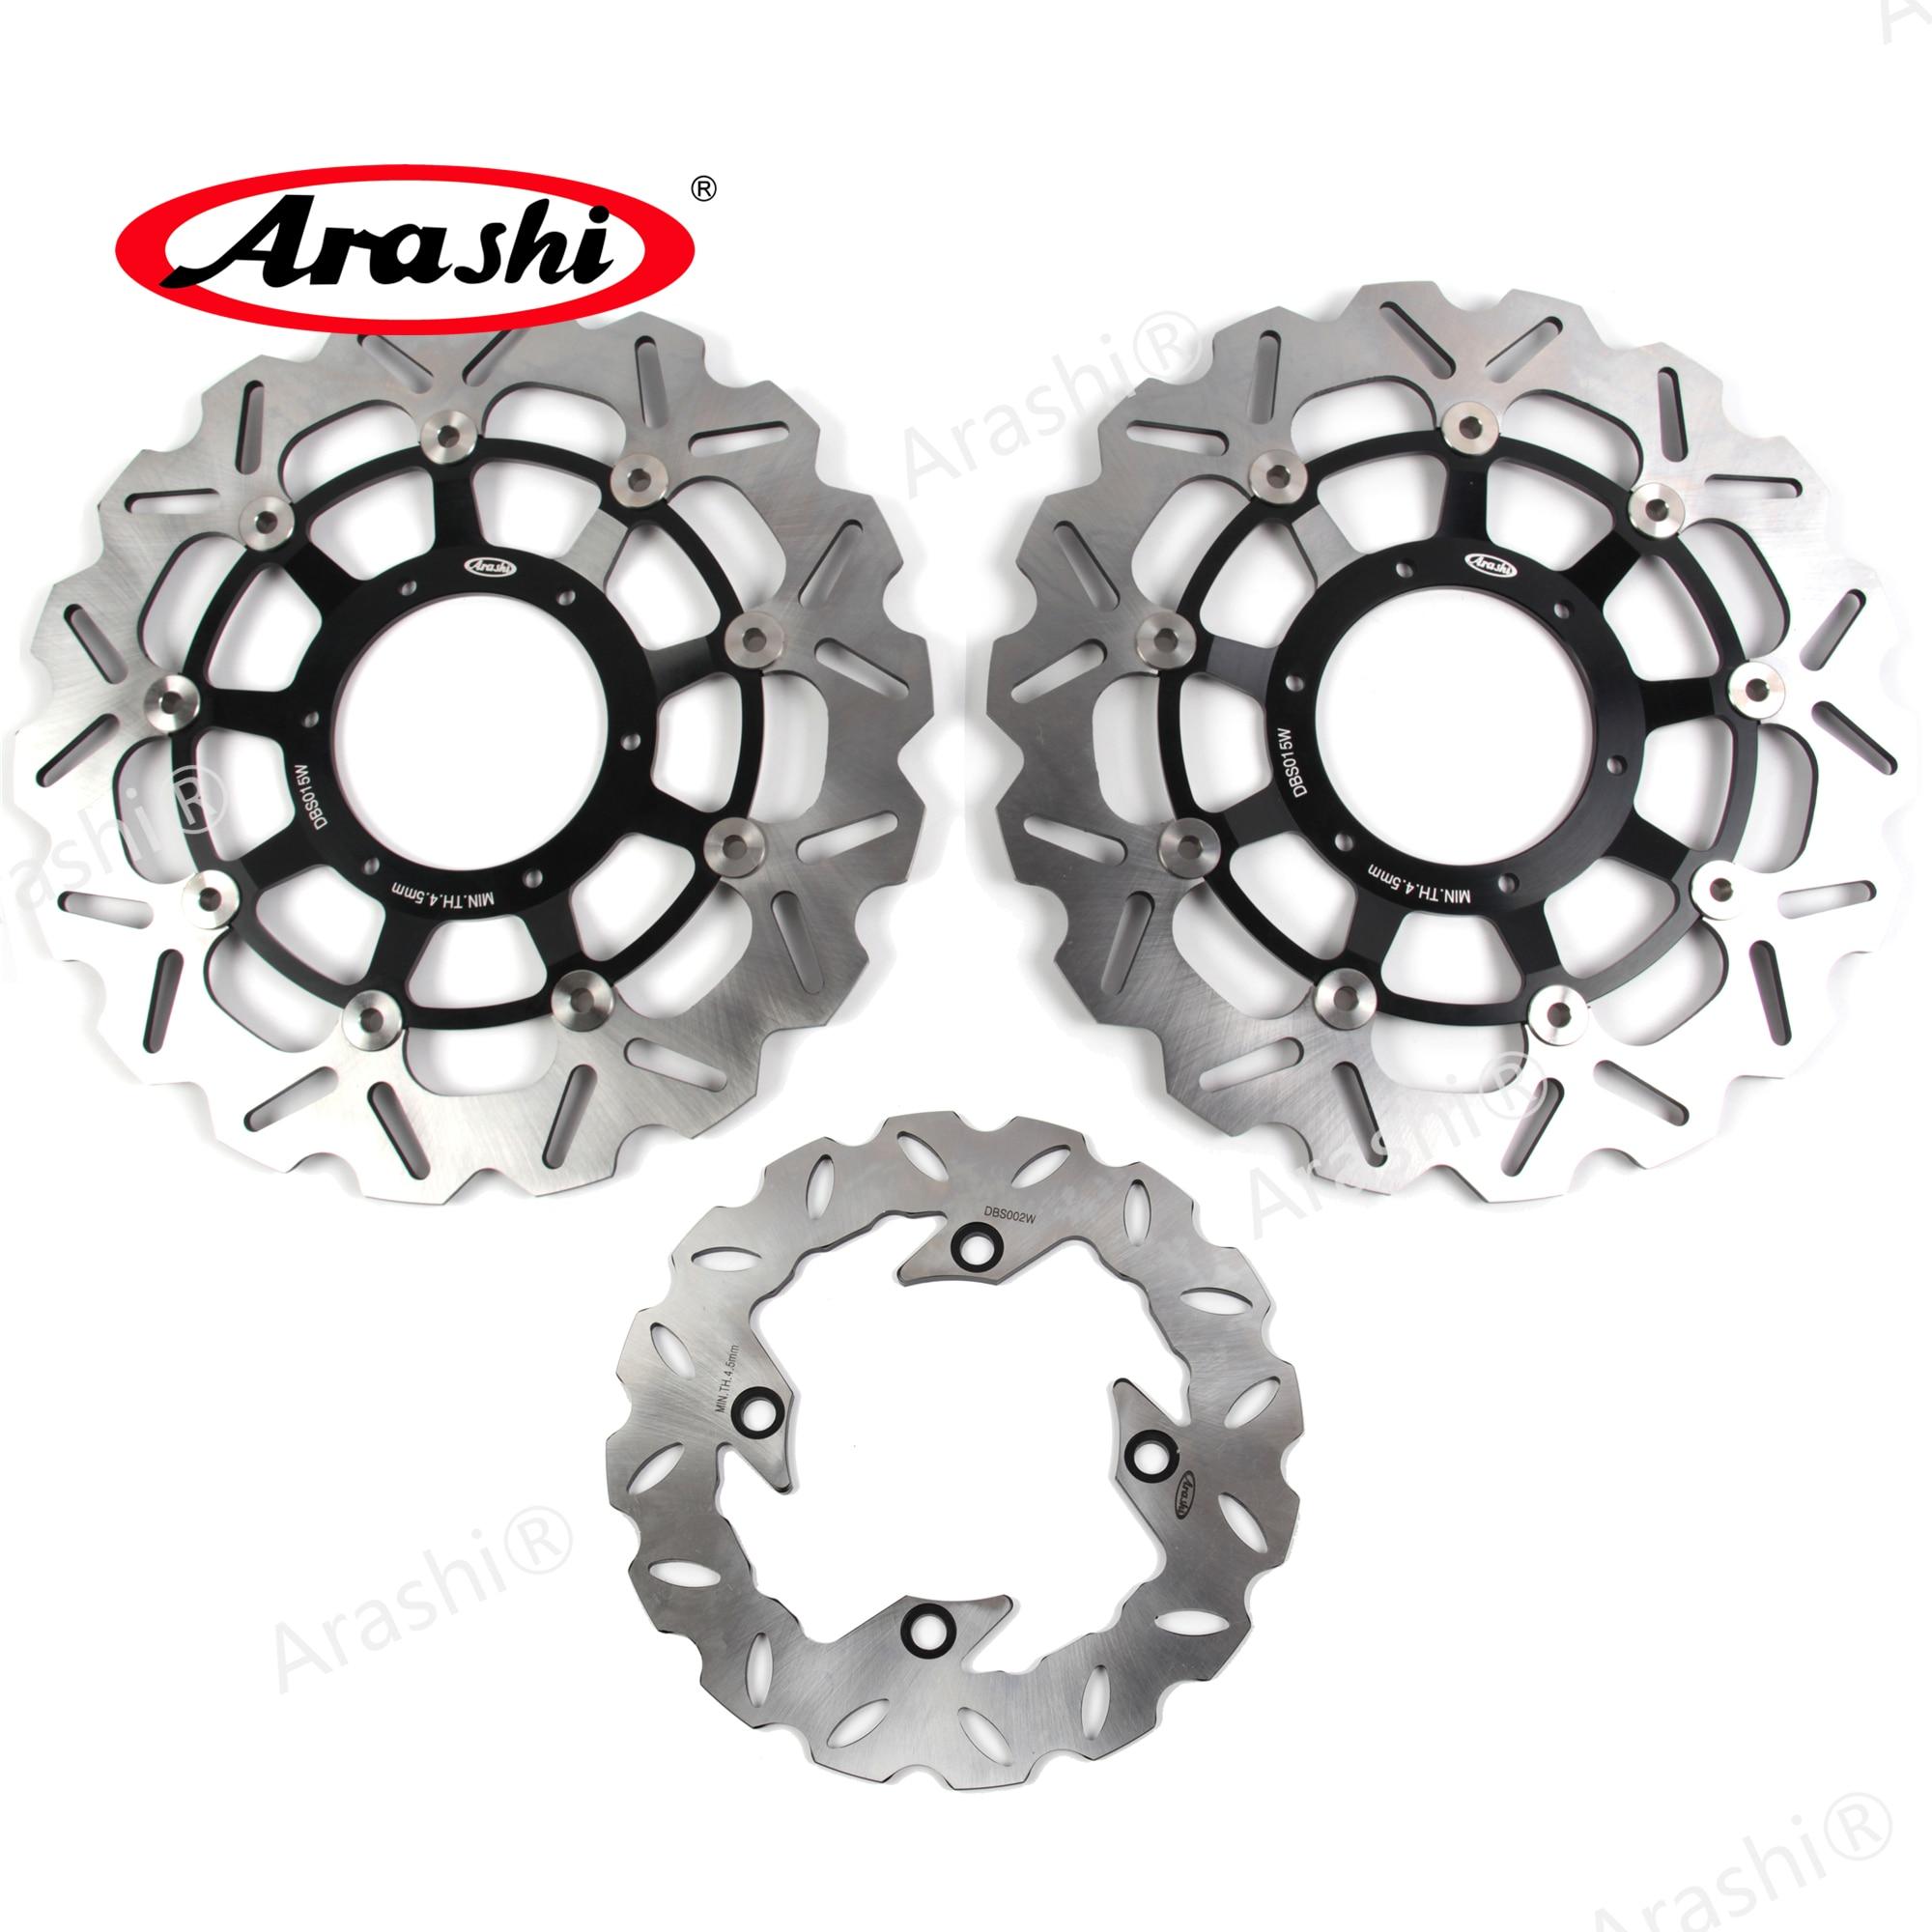 Arashi 1 Set Front Brake Disks Rear Brake Disc Rotors For HONDA CBR600RR CBR 600 RR 2003 2004 2005 2006 2007 2008 2009 2010 2011